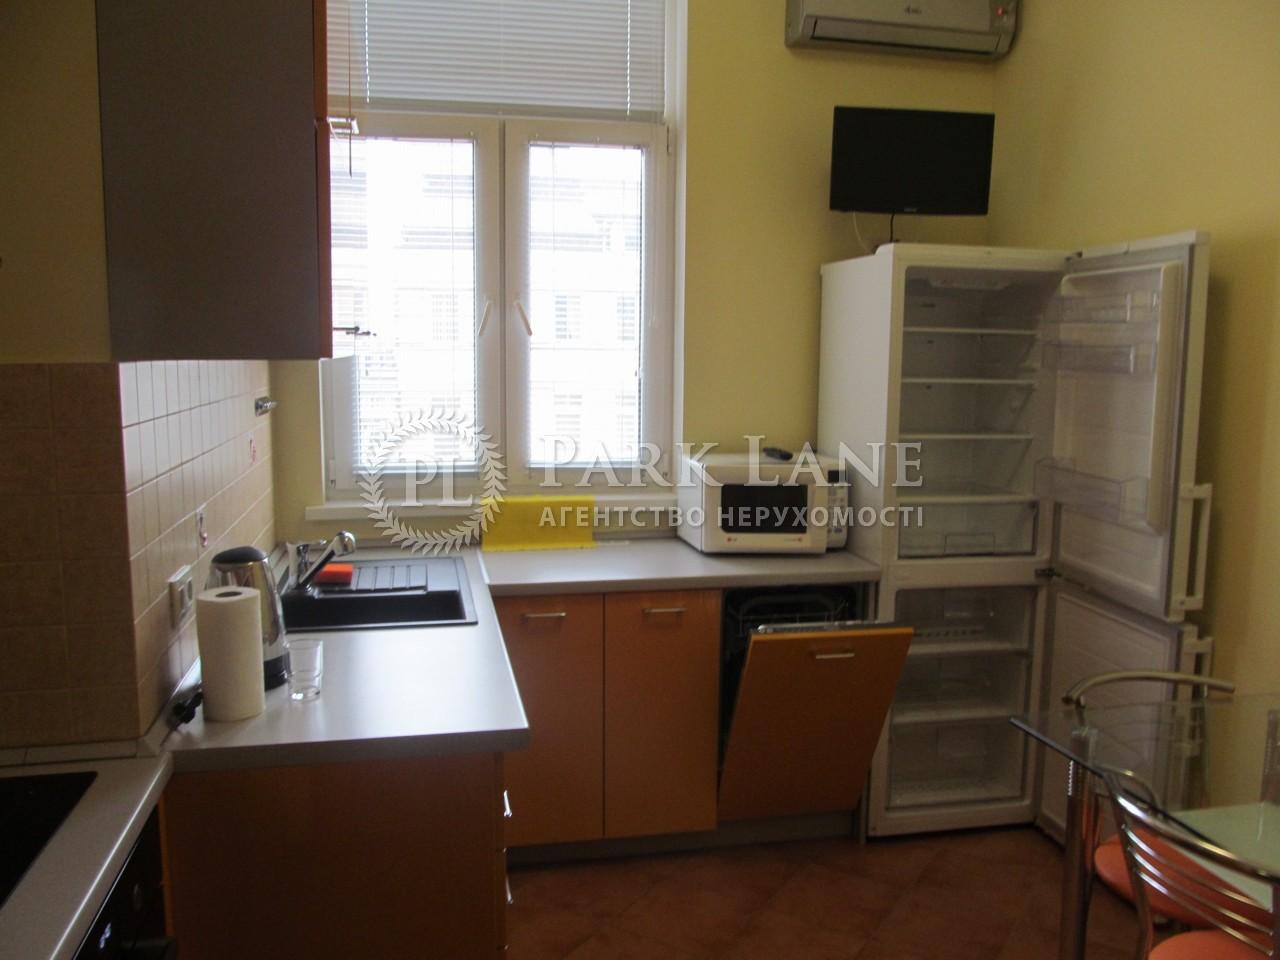 Квартира вул. Жилянська, 118, Київ, R-13819 - Фото 9